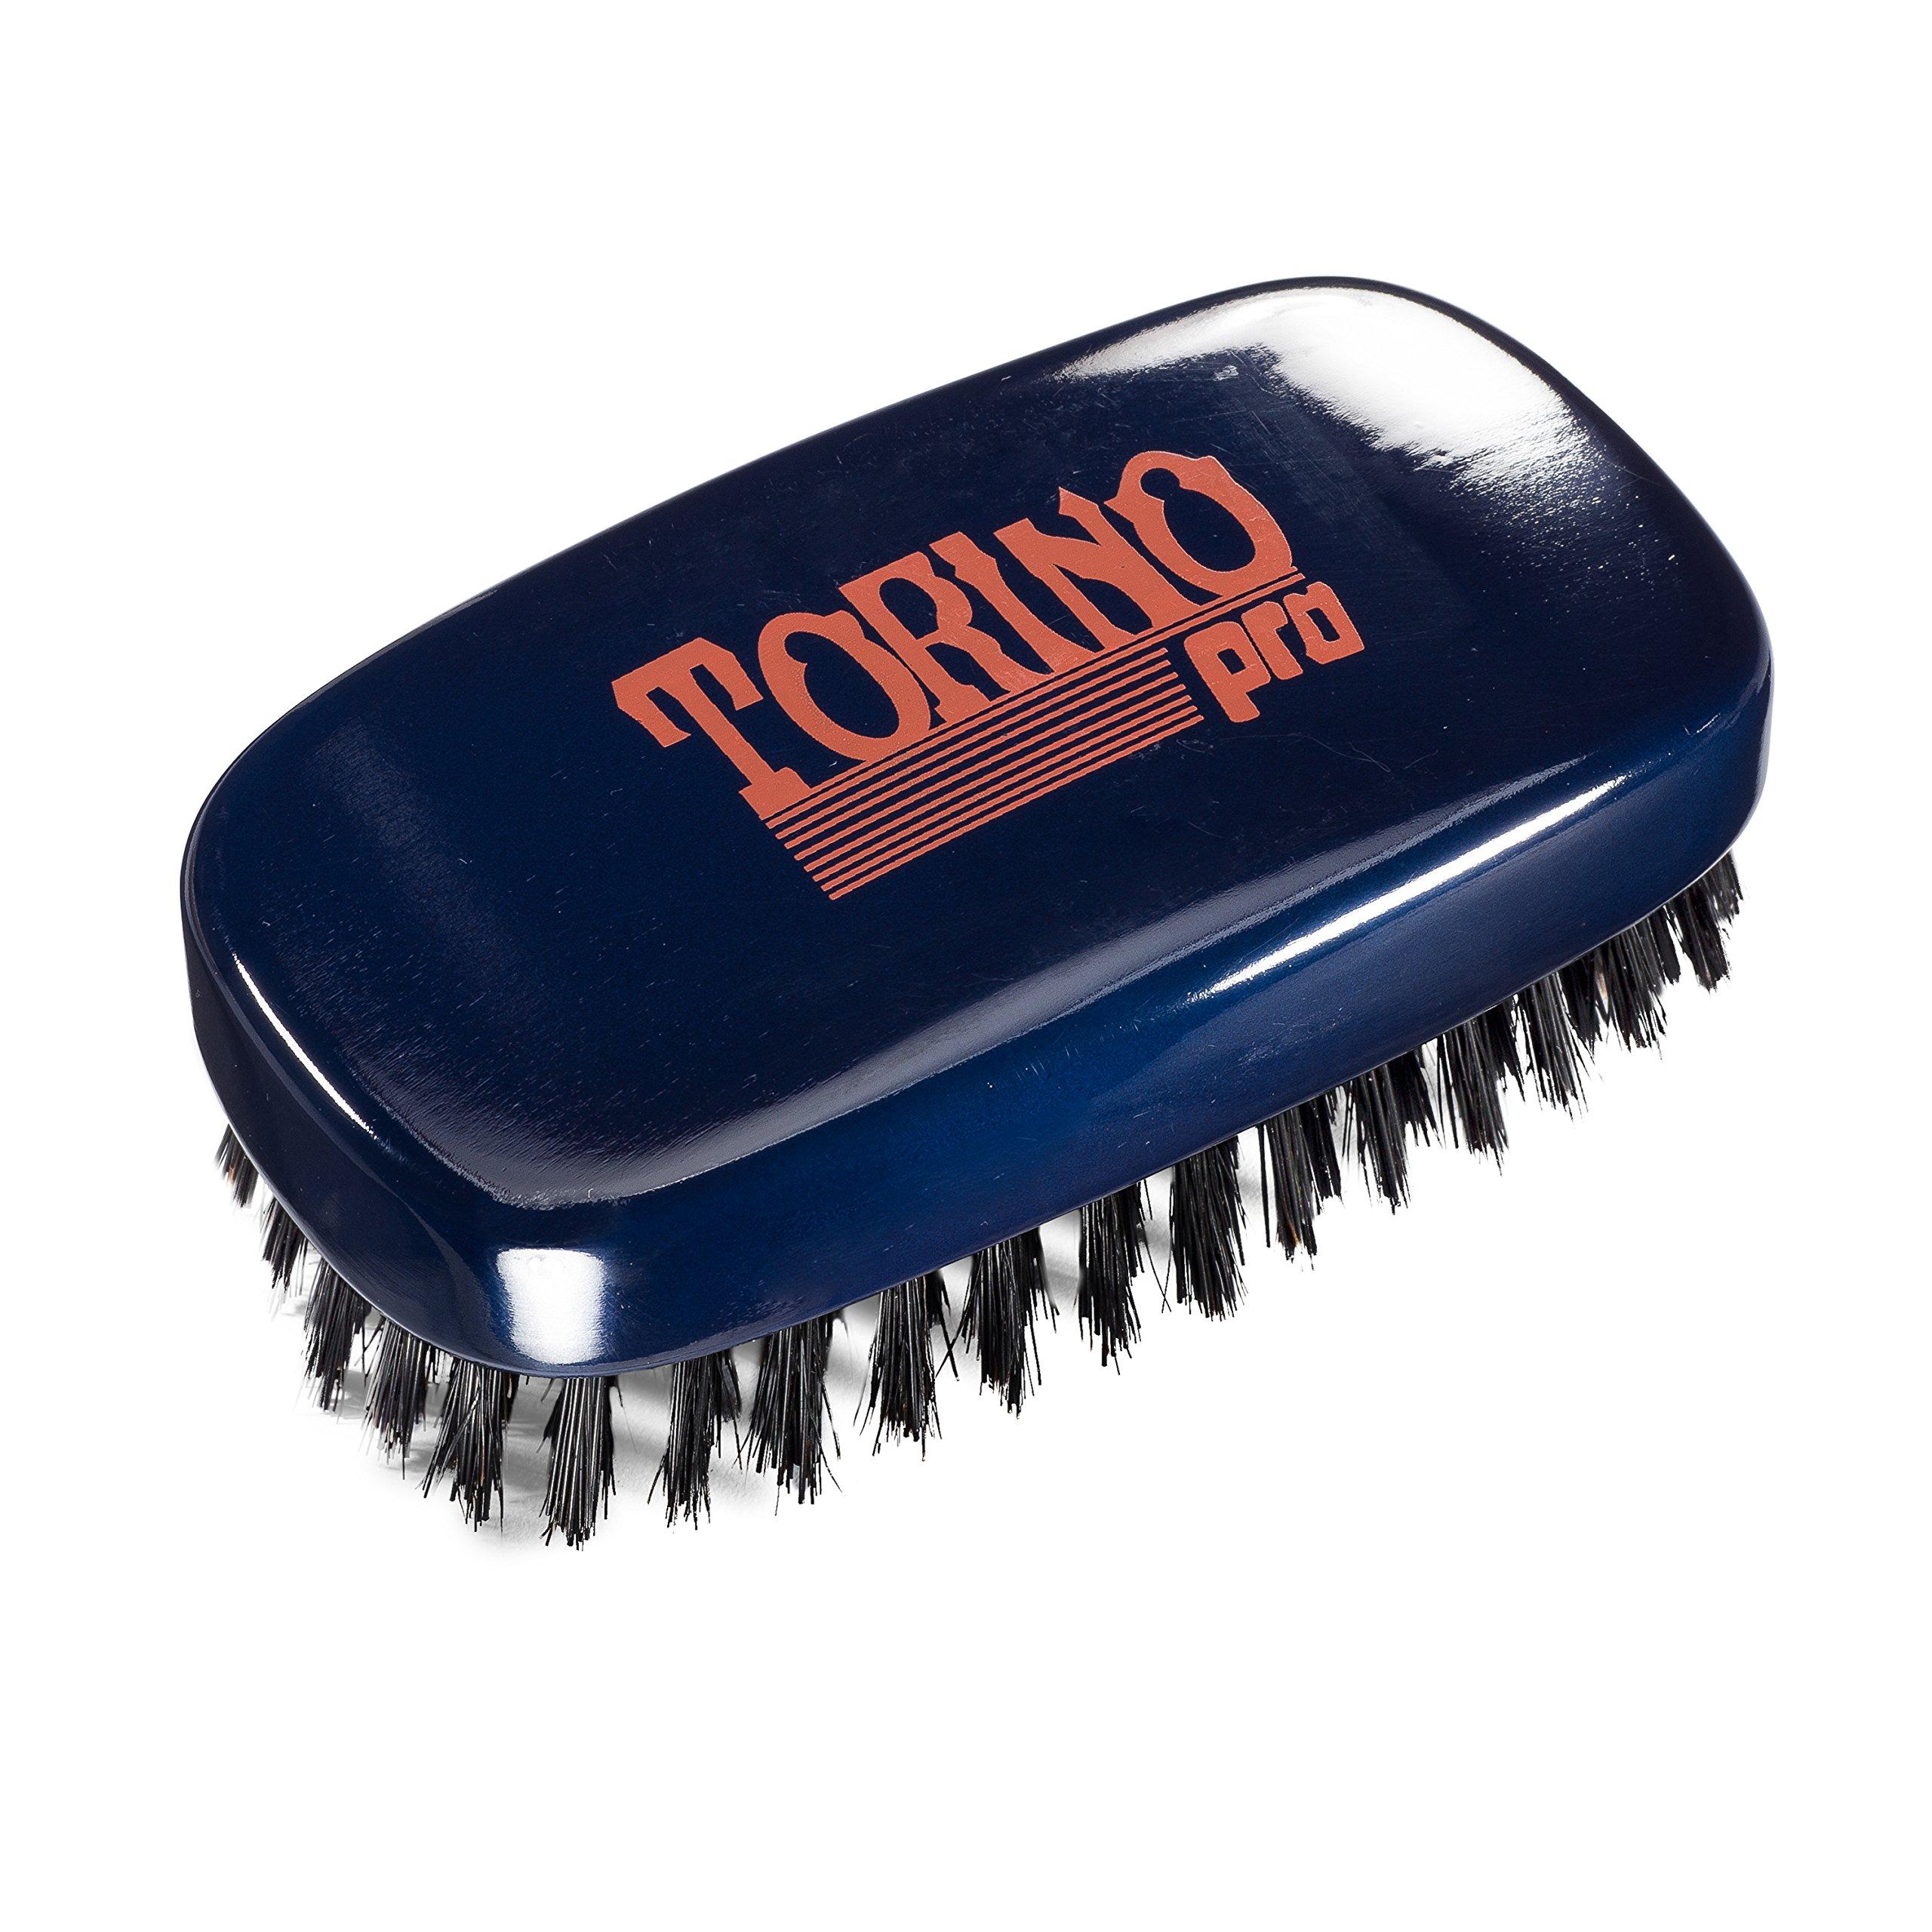 Torino Pro Wave Brush #770 By Brush King - 11 Row Medium Hard 360 Waves Palm Brush - Great for Wolfing